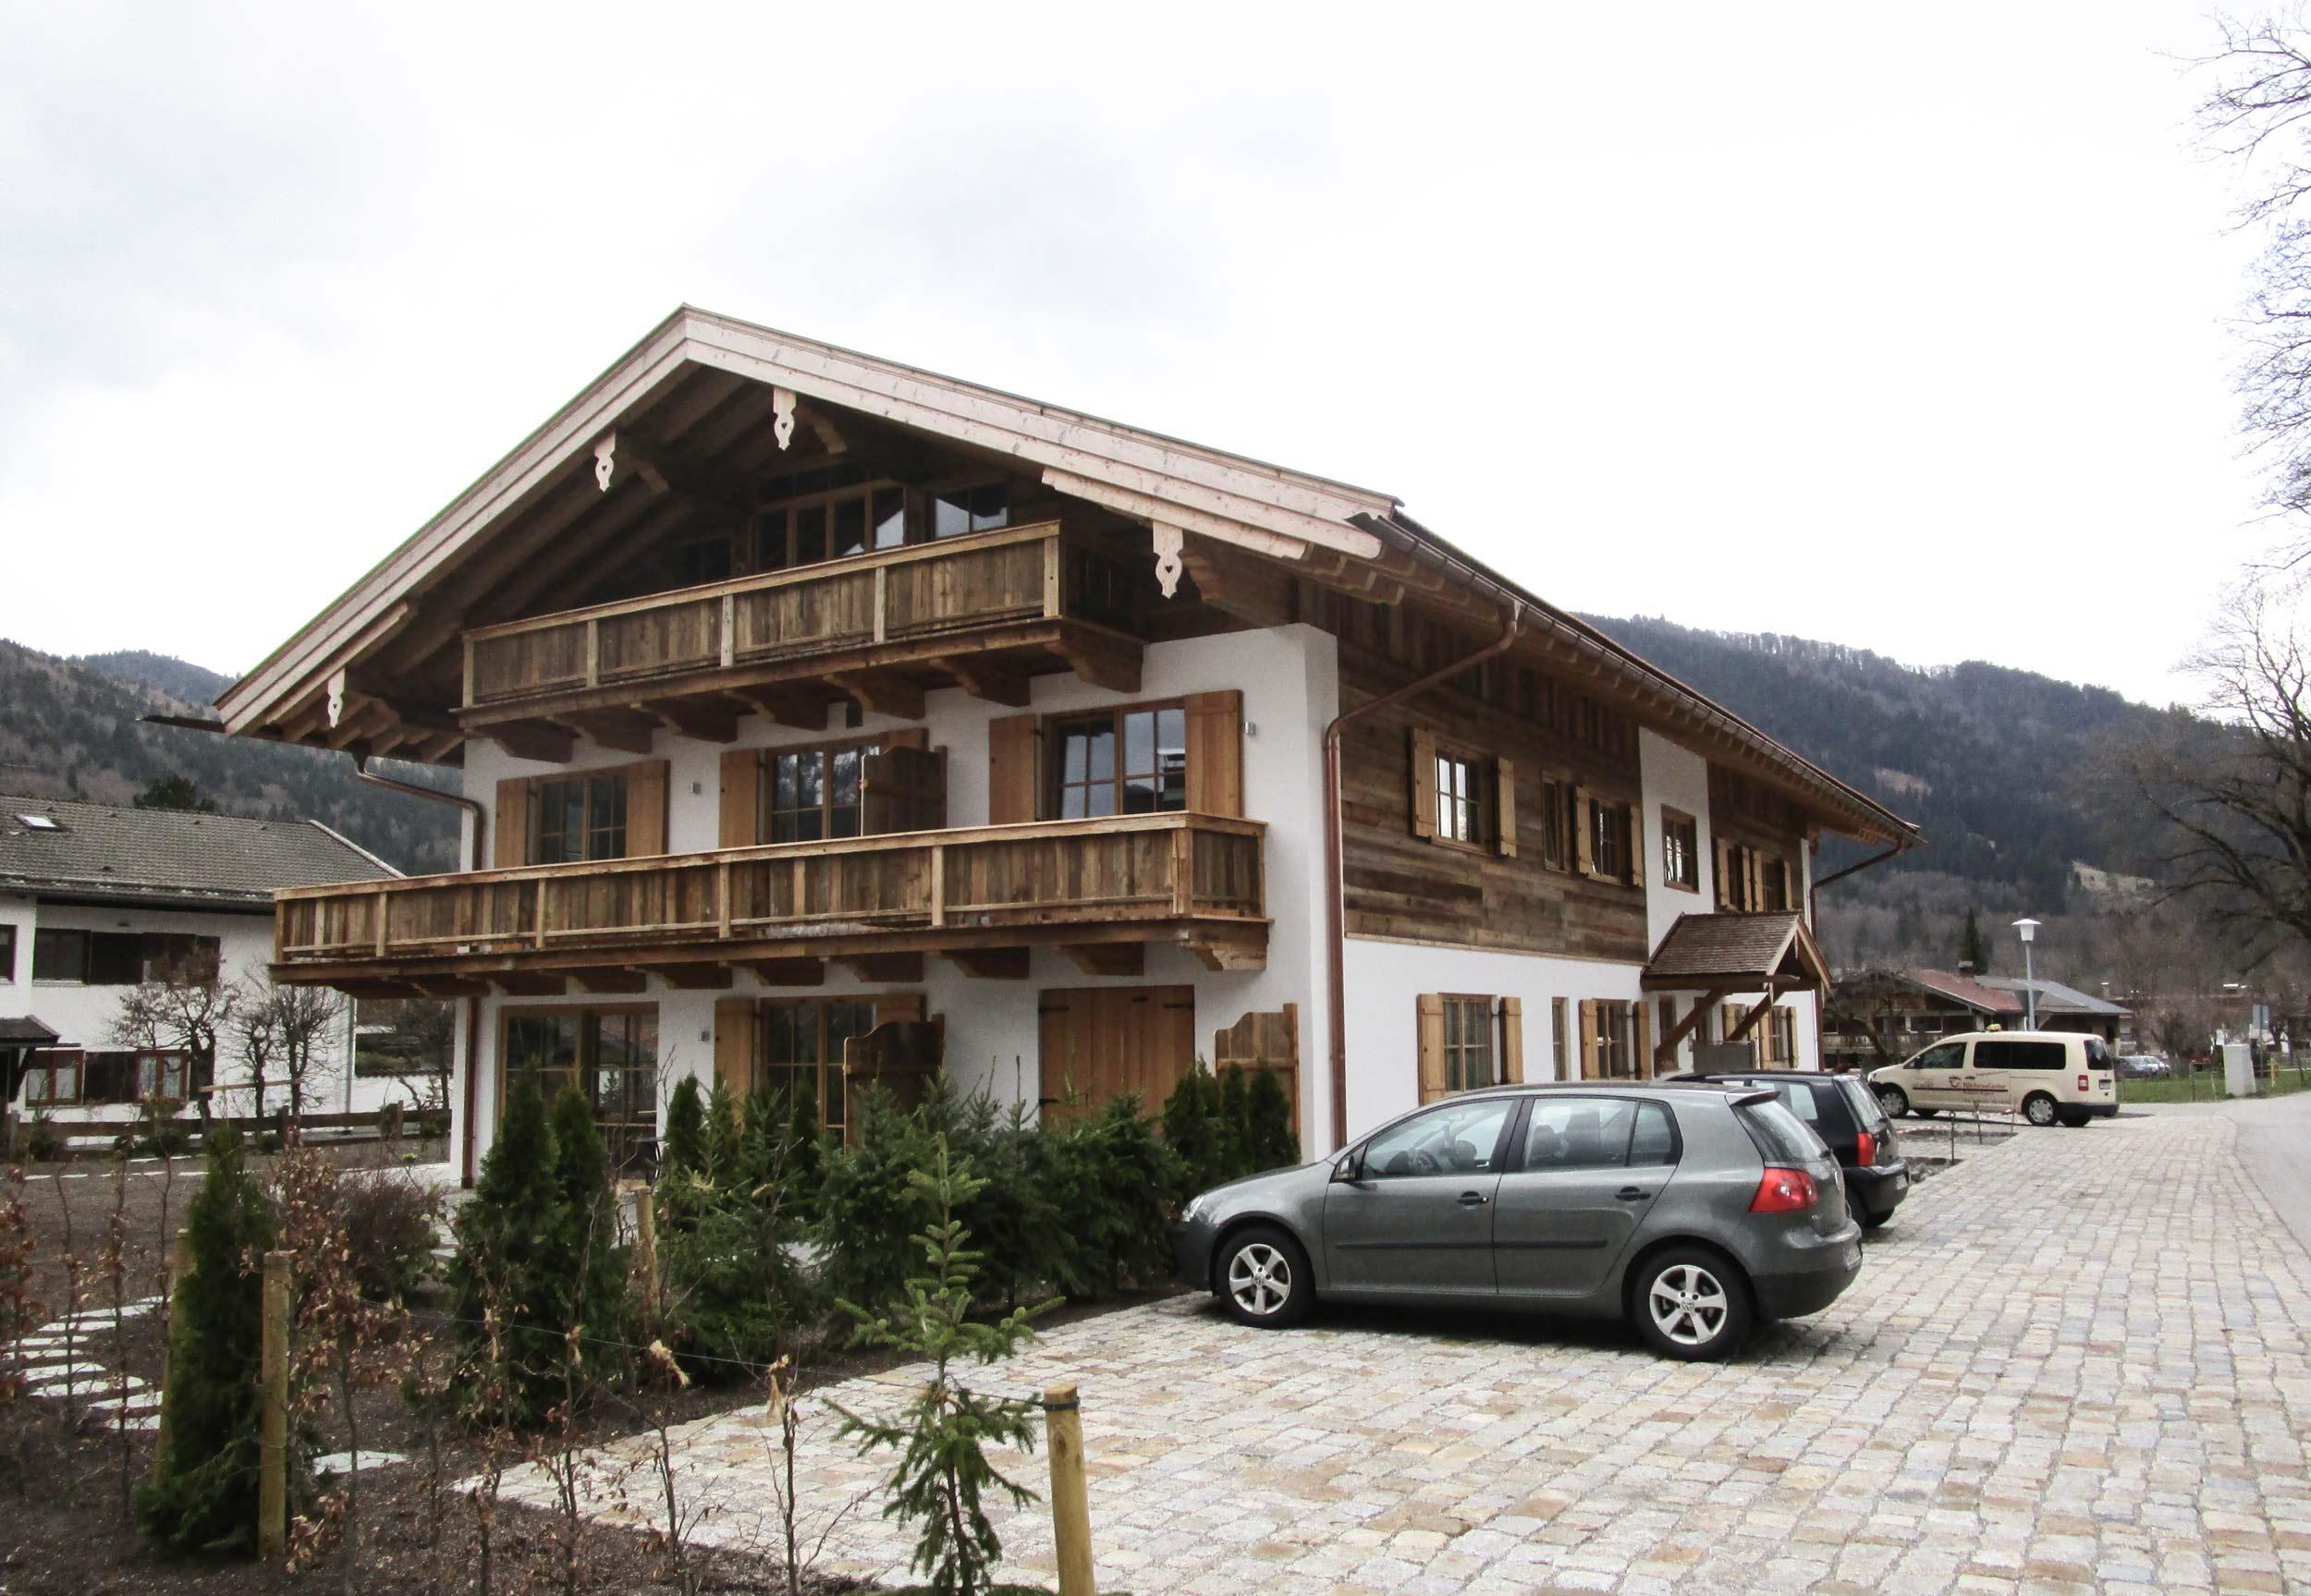 zimmerei-stoib-holzbau-holzhaus-altholz-fassade-blockschalung-merhfamilienhaus-balkon-01.jpg